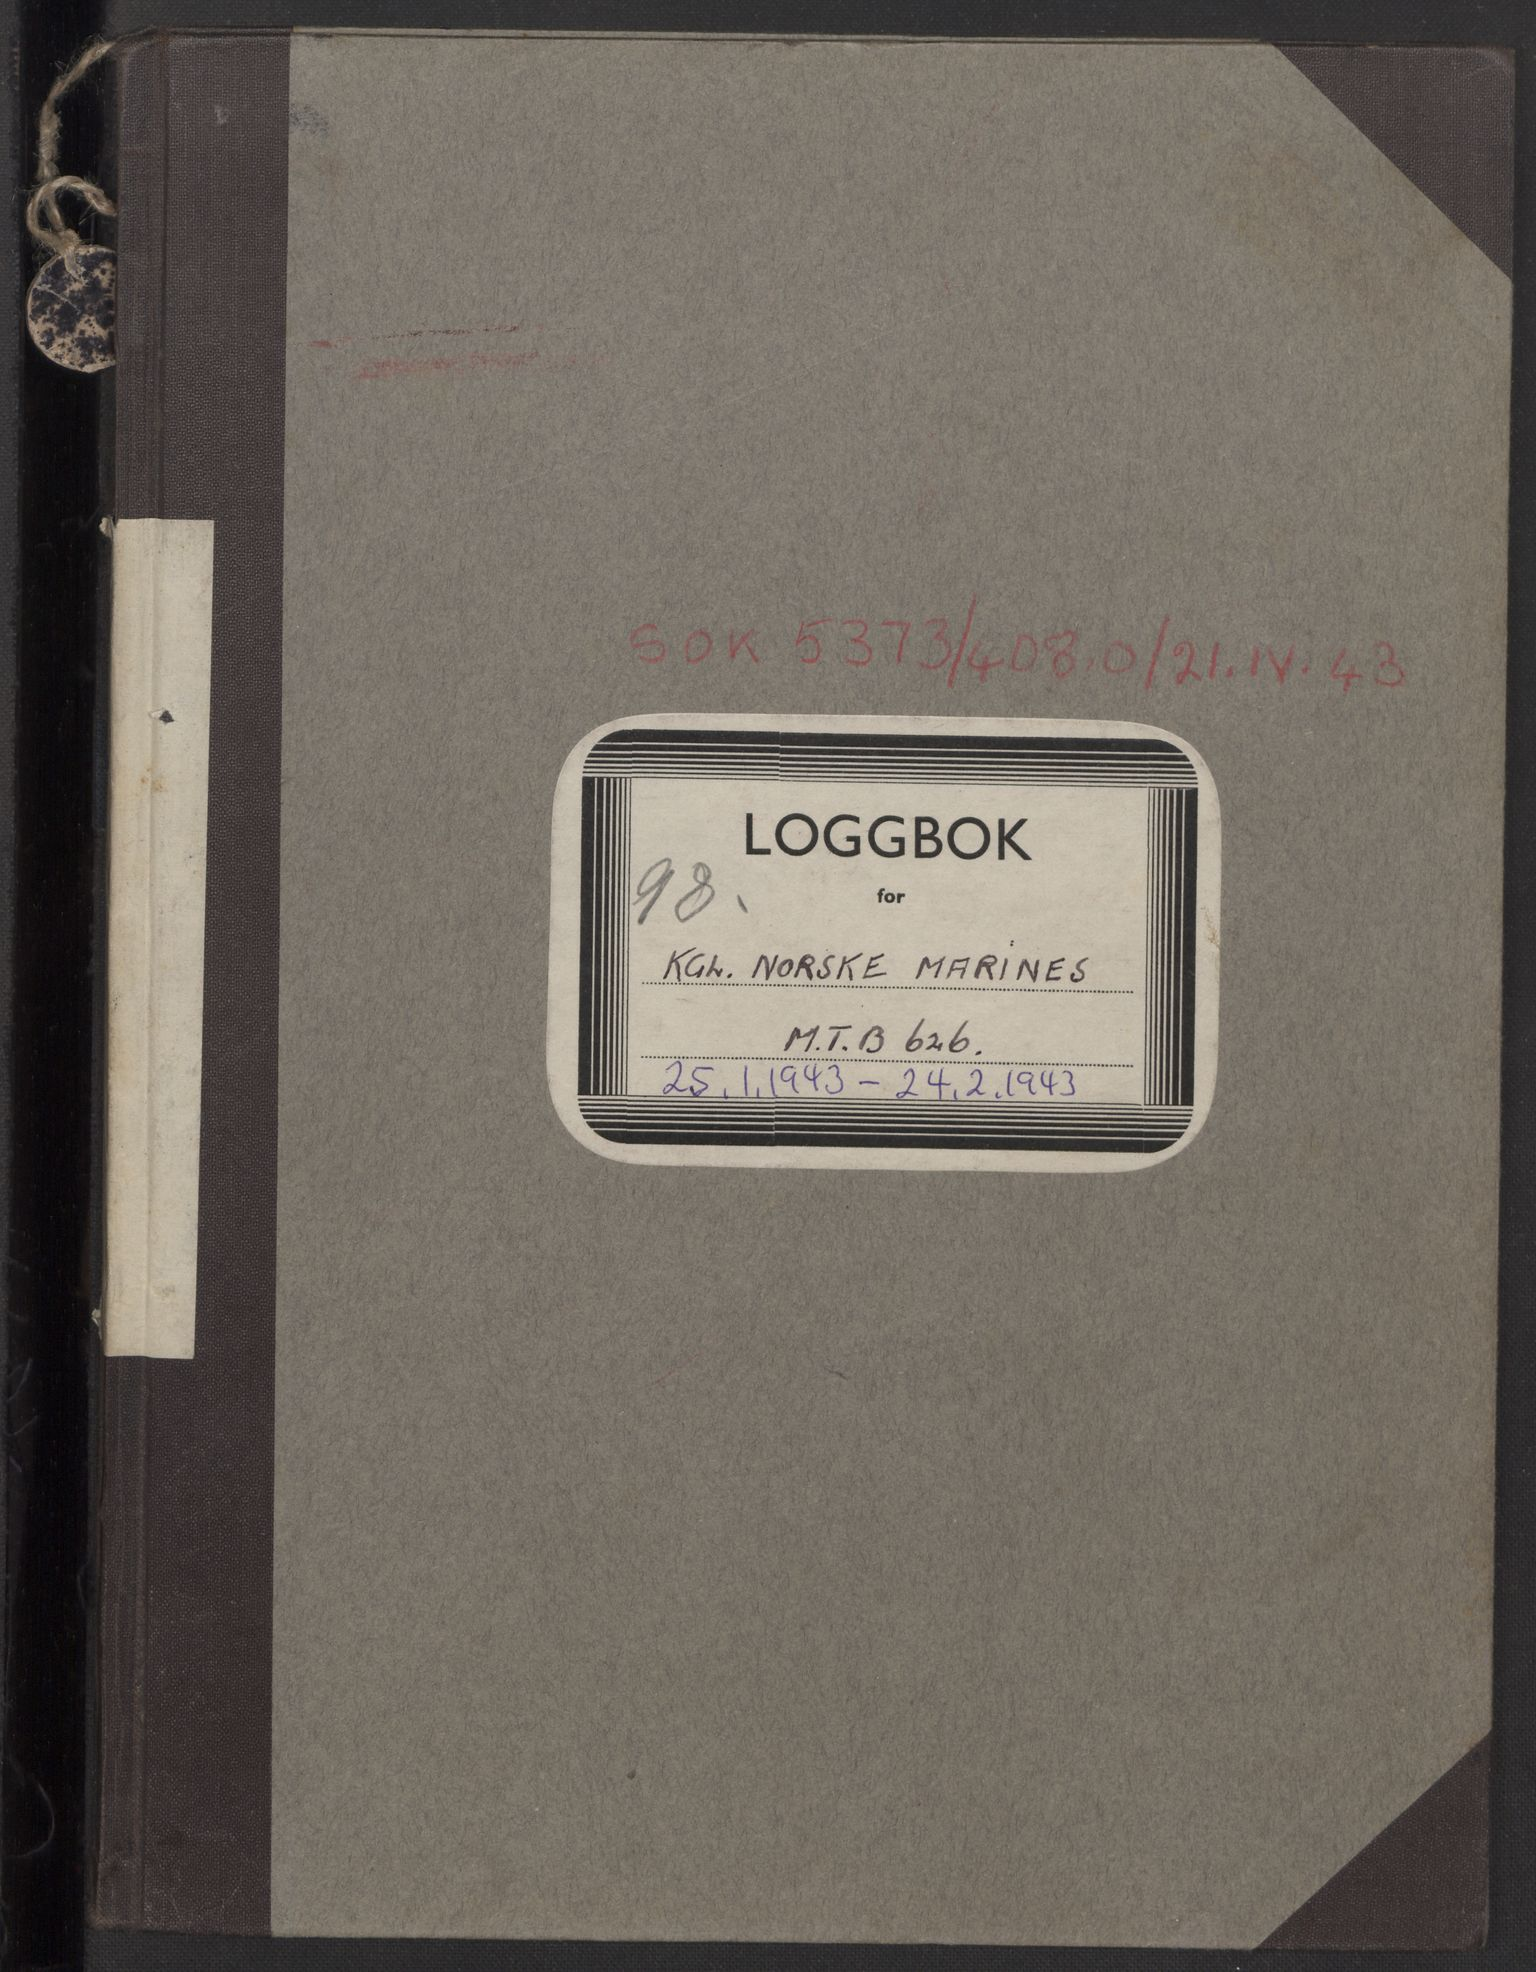 RA, Forsvaret, Sjøforsvarets fartøyer, Gm6/L0002: Loggbok, 1943